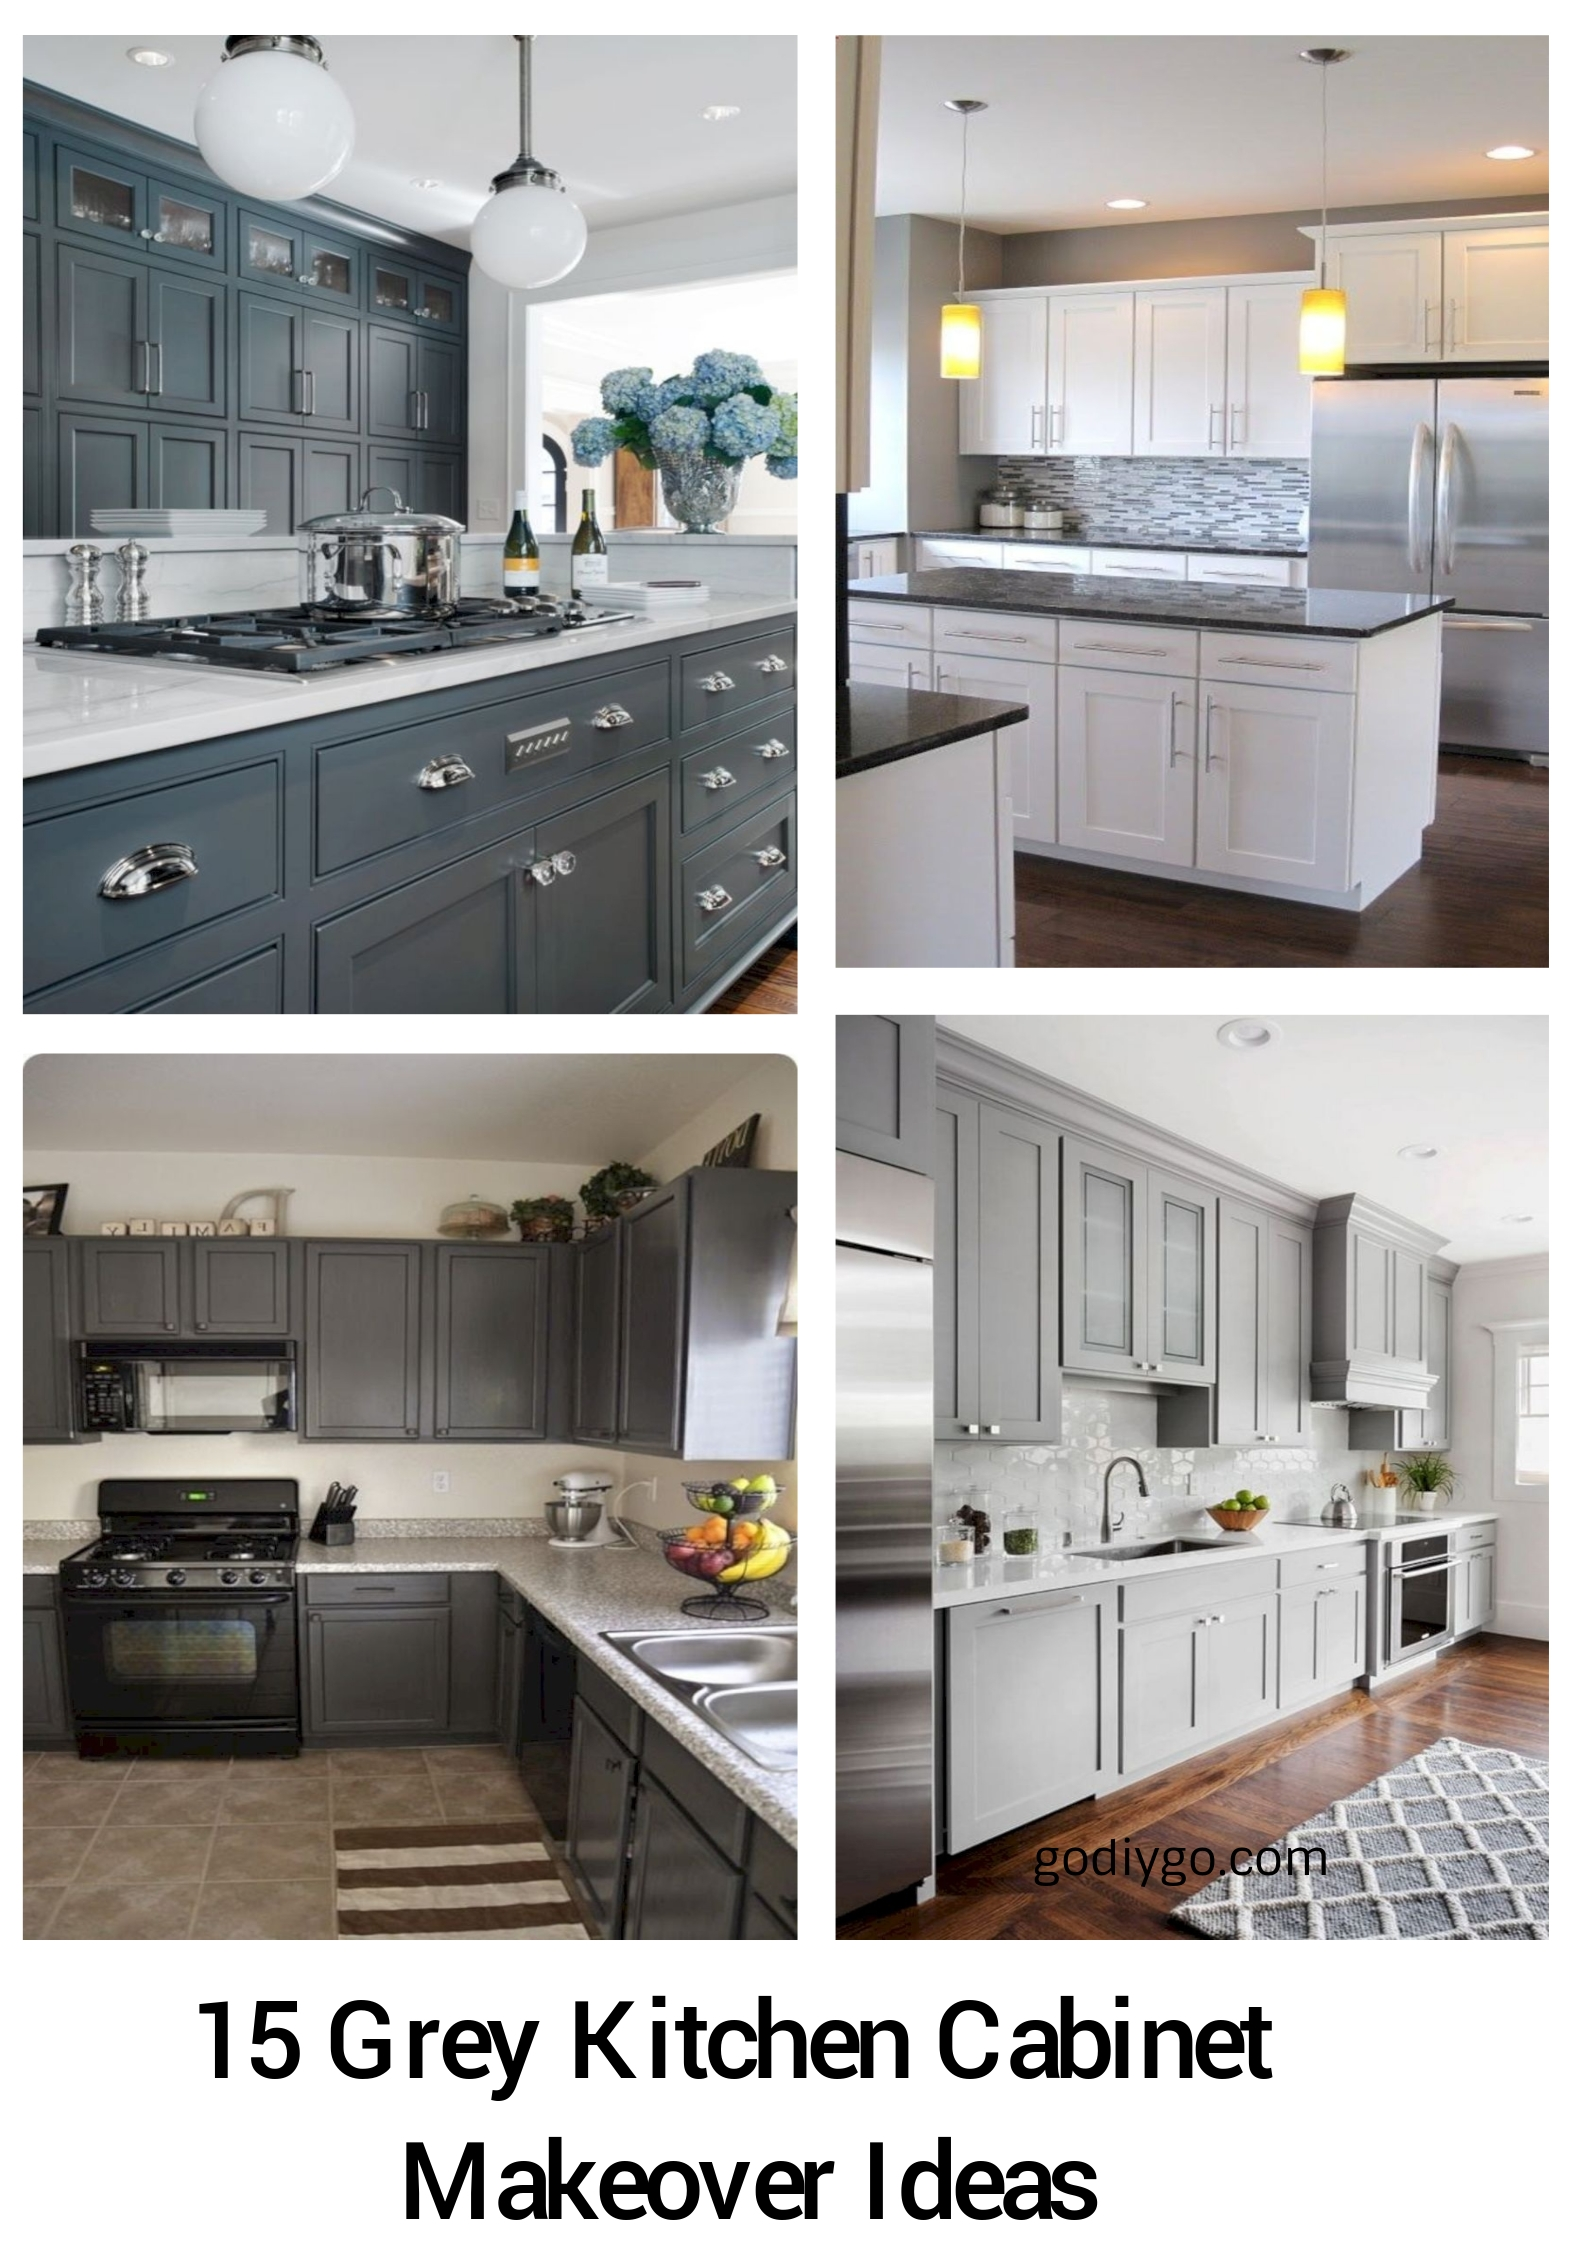 15 Grey Kitchen Cabinet Makeover Ideas GODIYGO